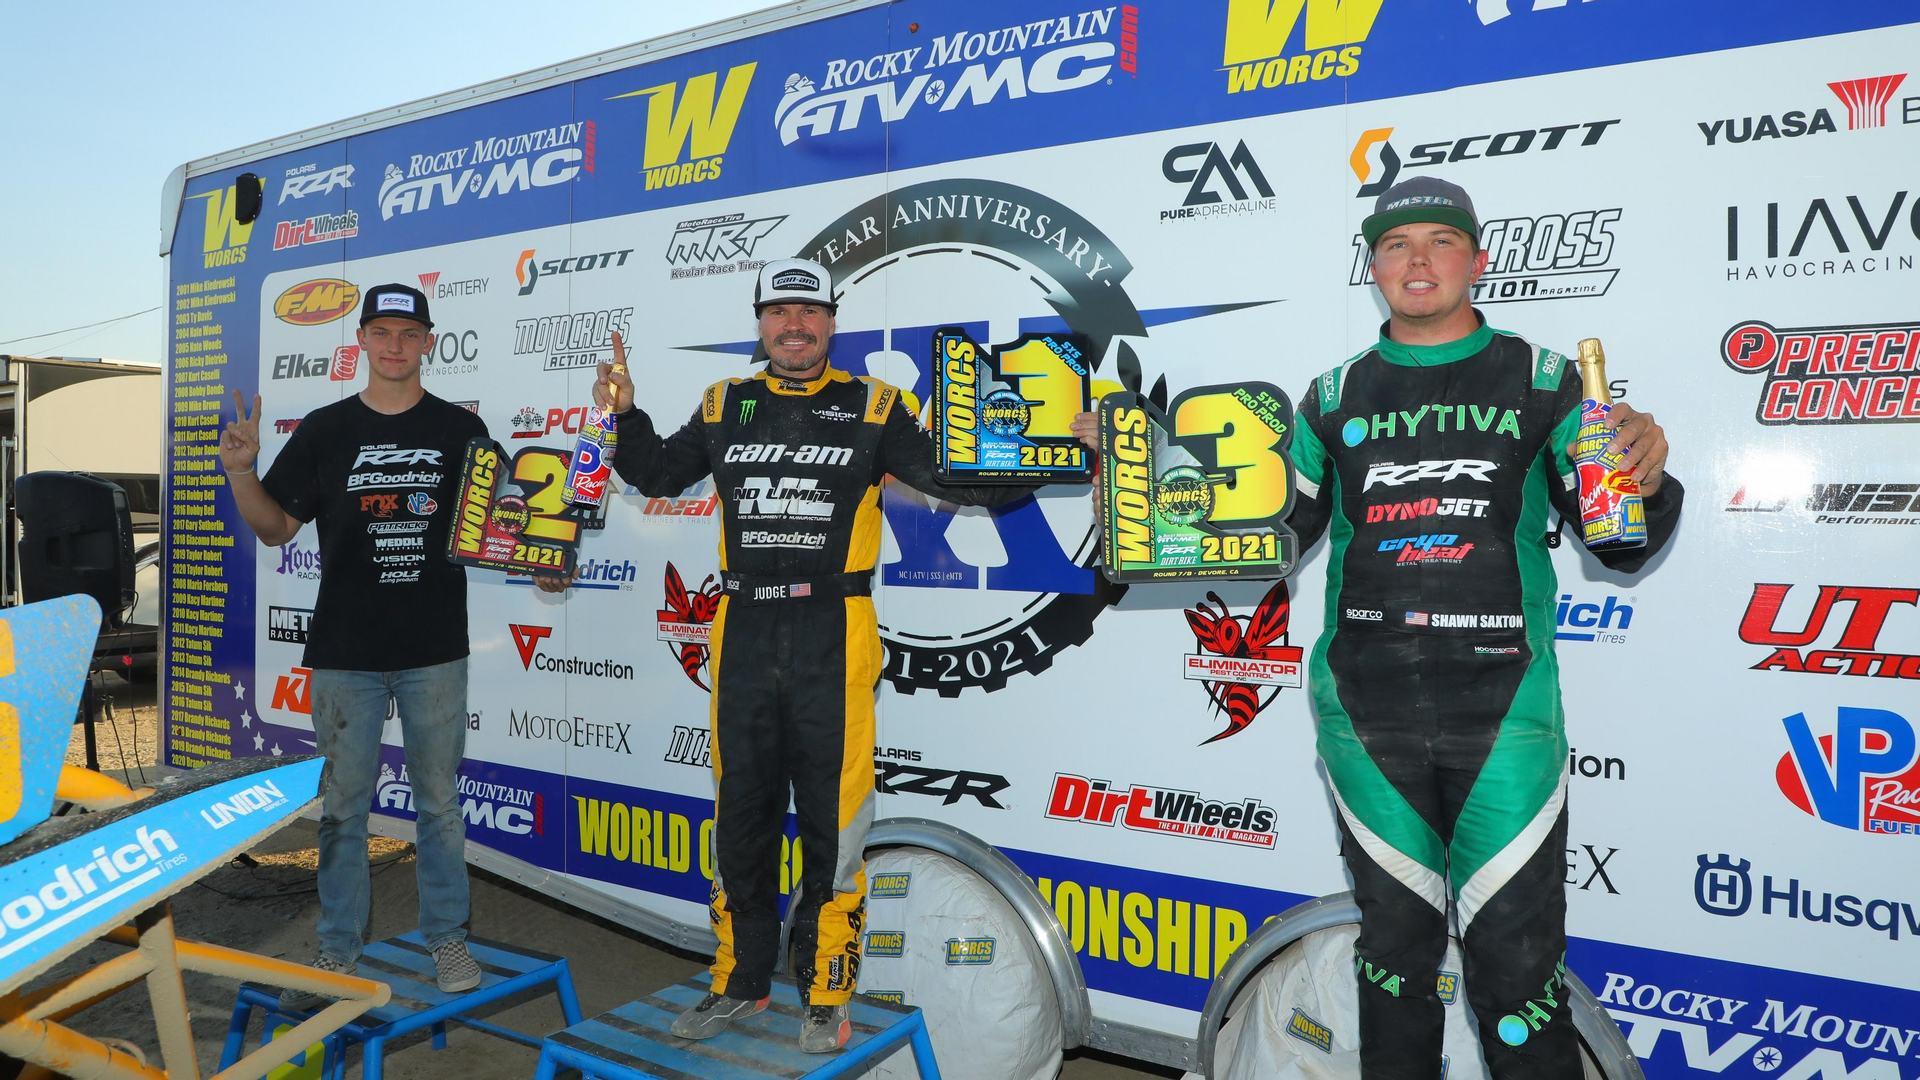 Team Hytiva's Shawn Saxton takes 3rd Place at Round 8 Glen Helen